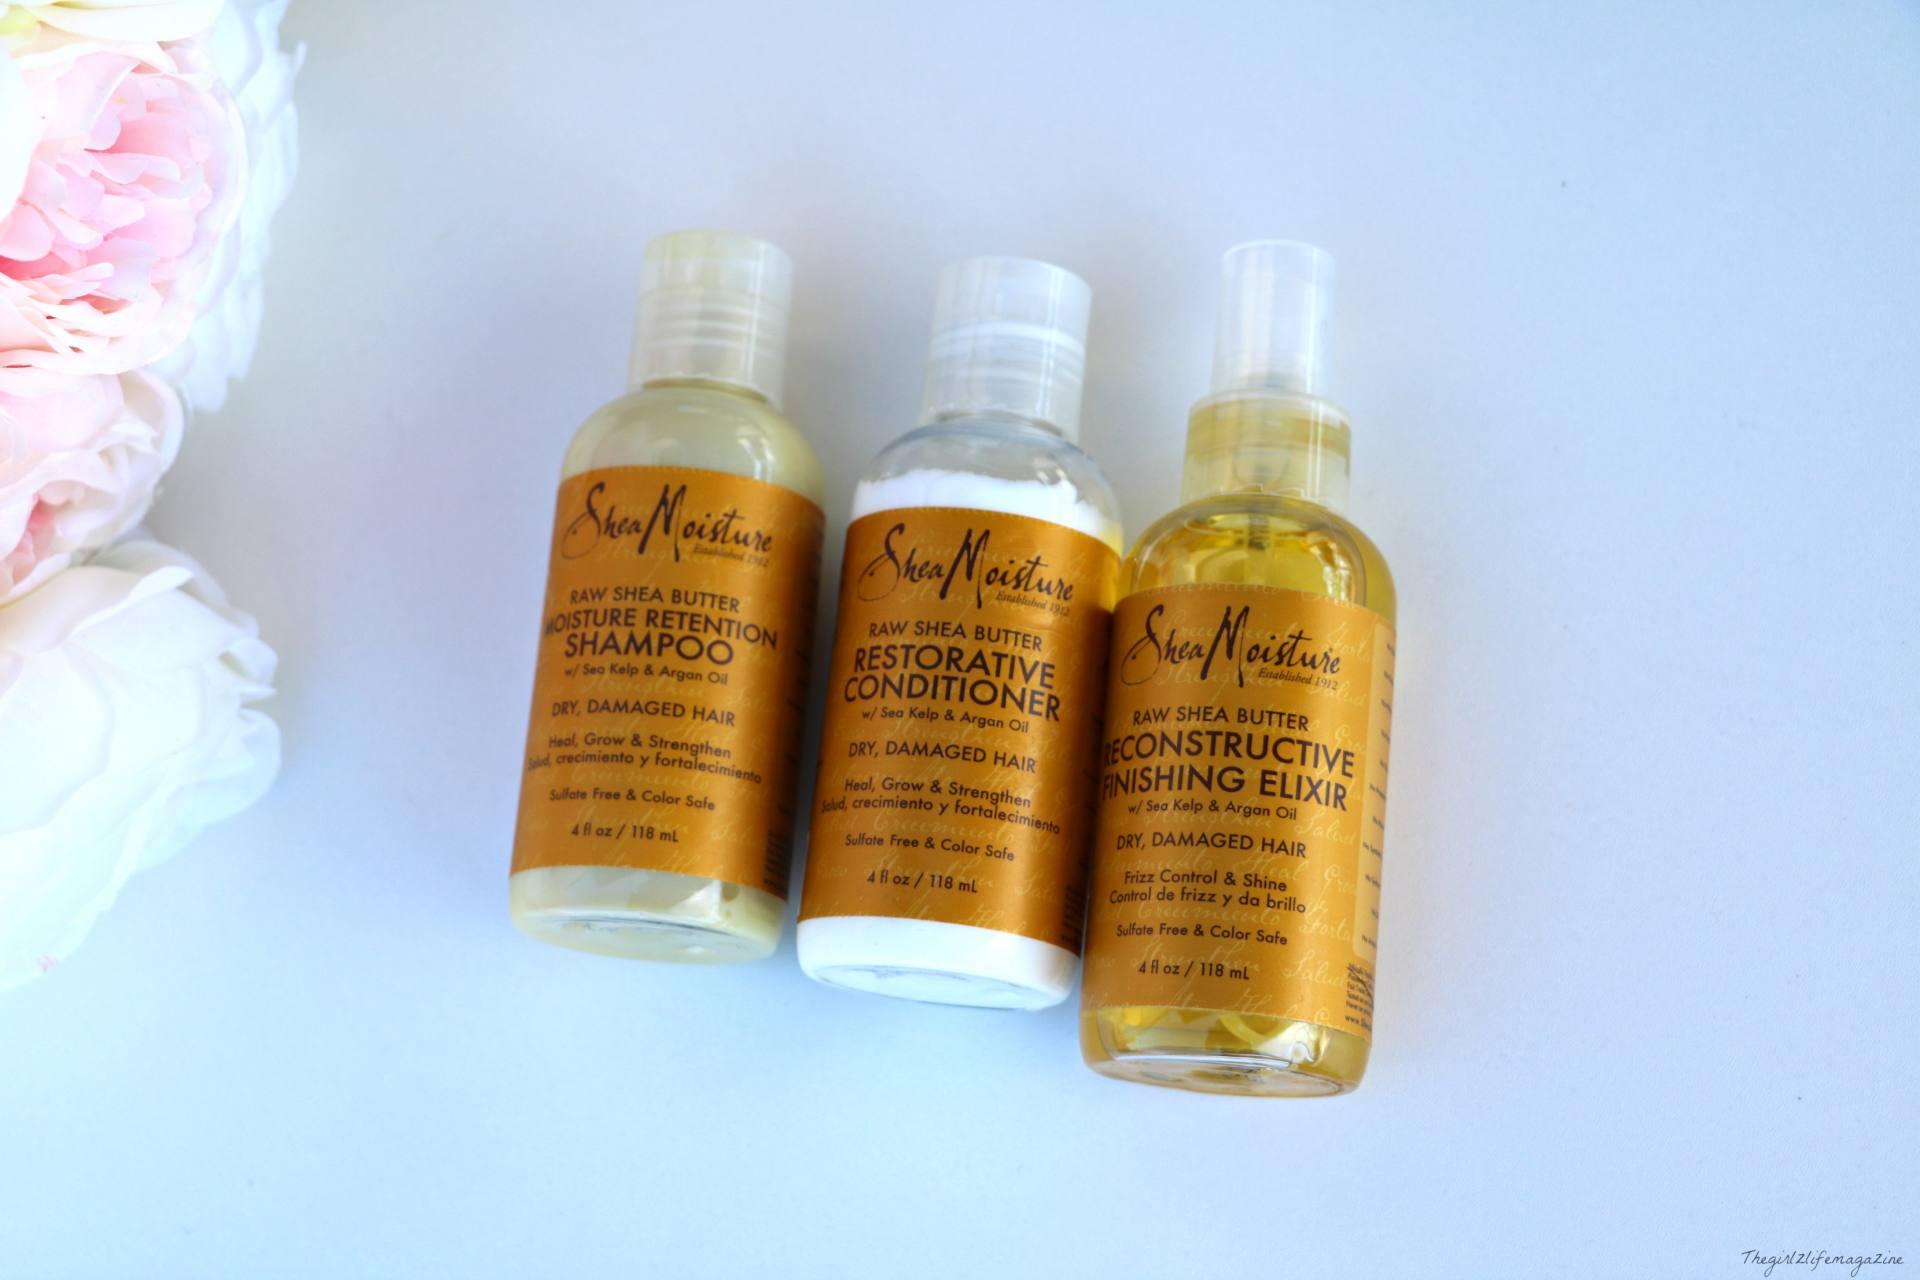 Shea moisture gamme jaune